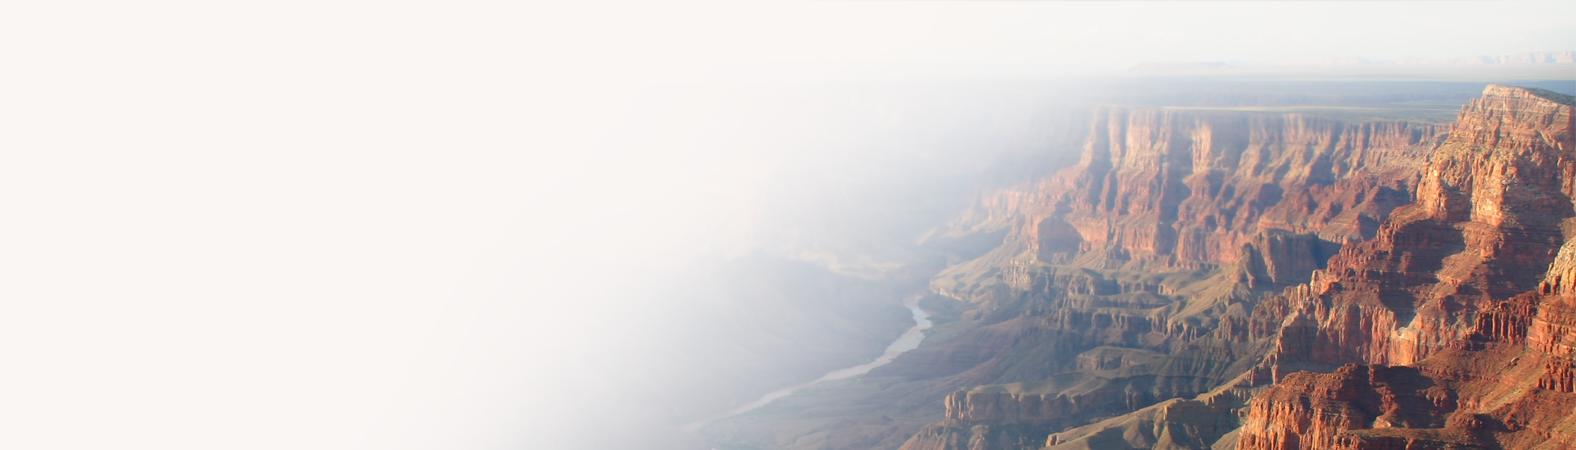 slide_environment_grand_canyon